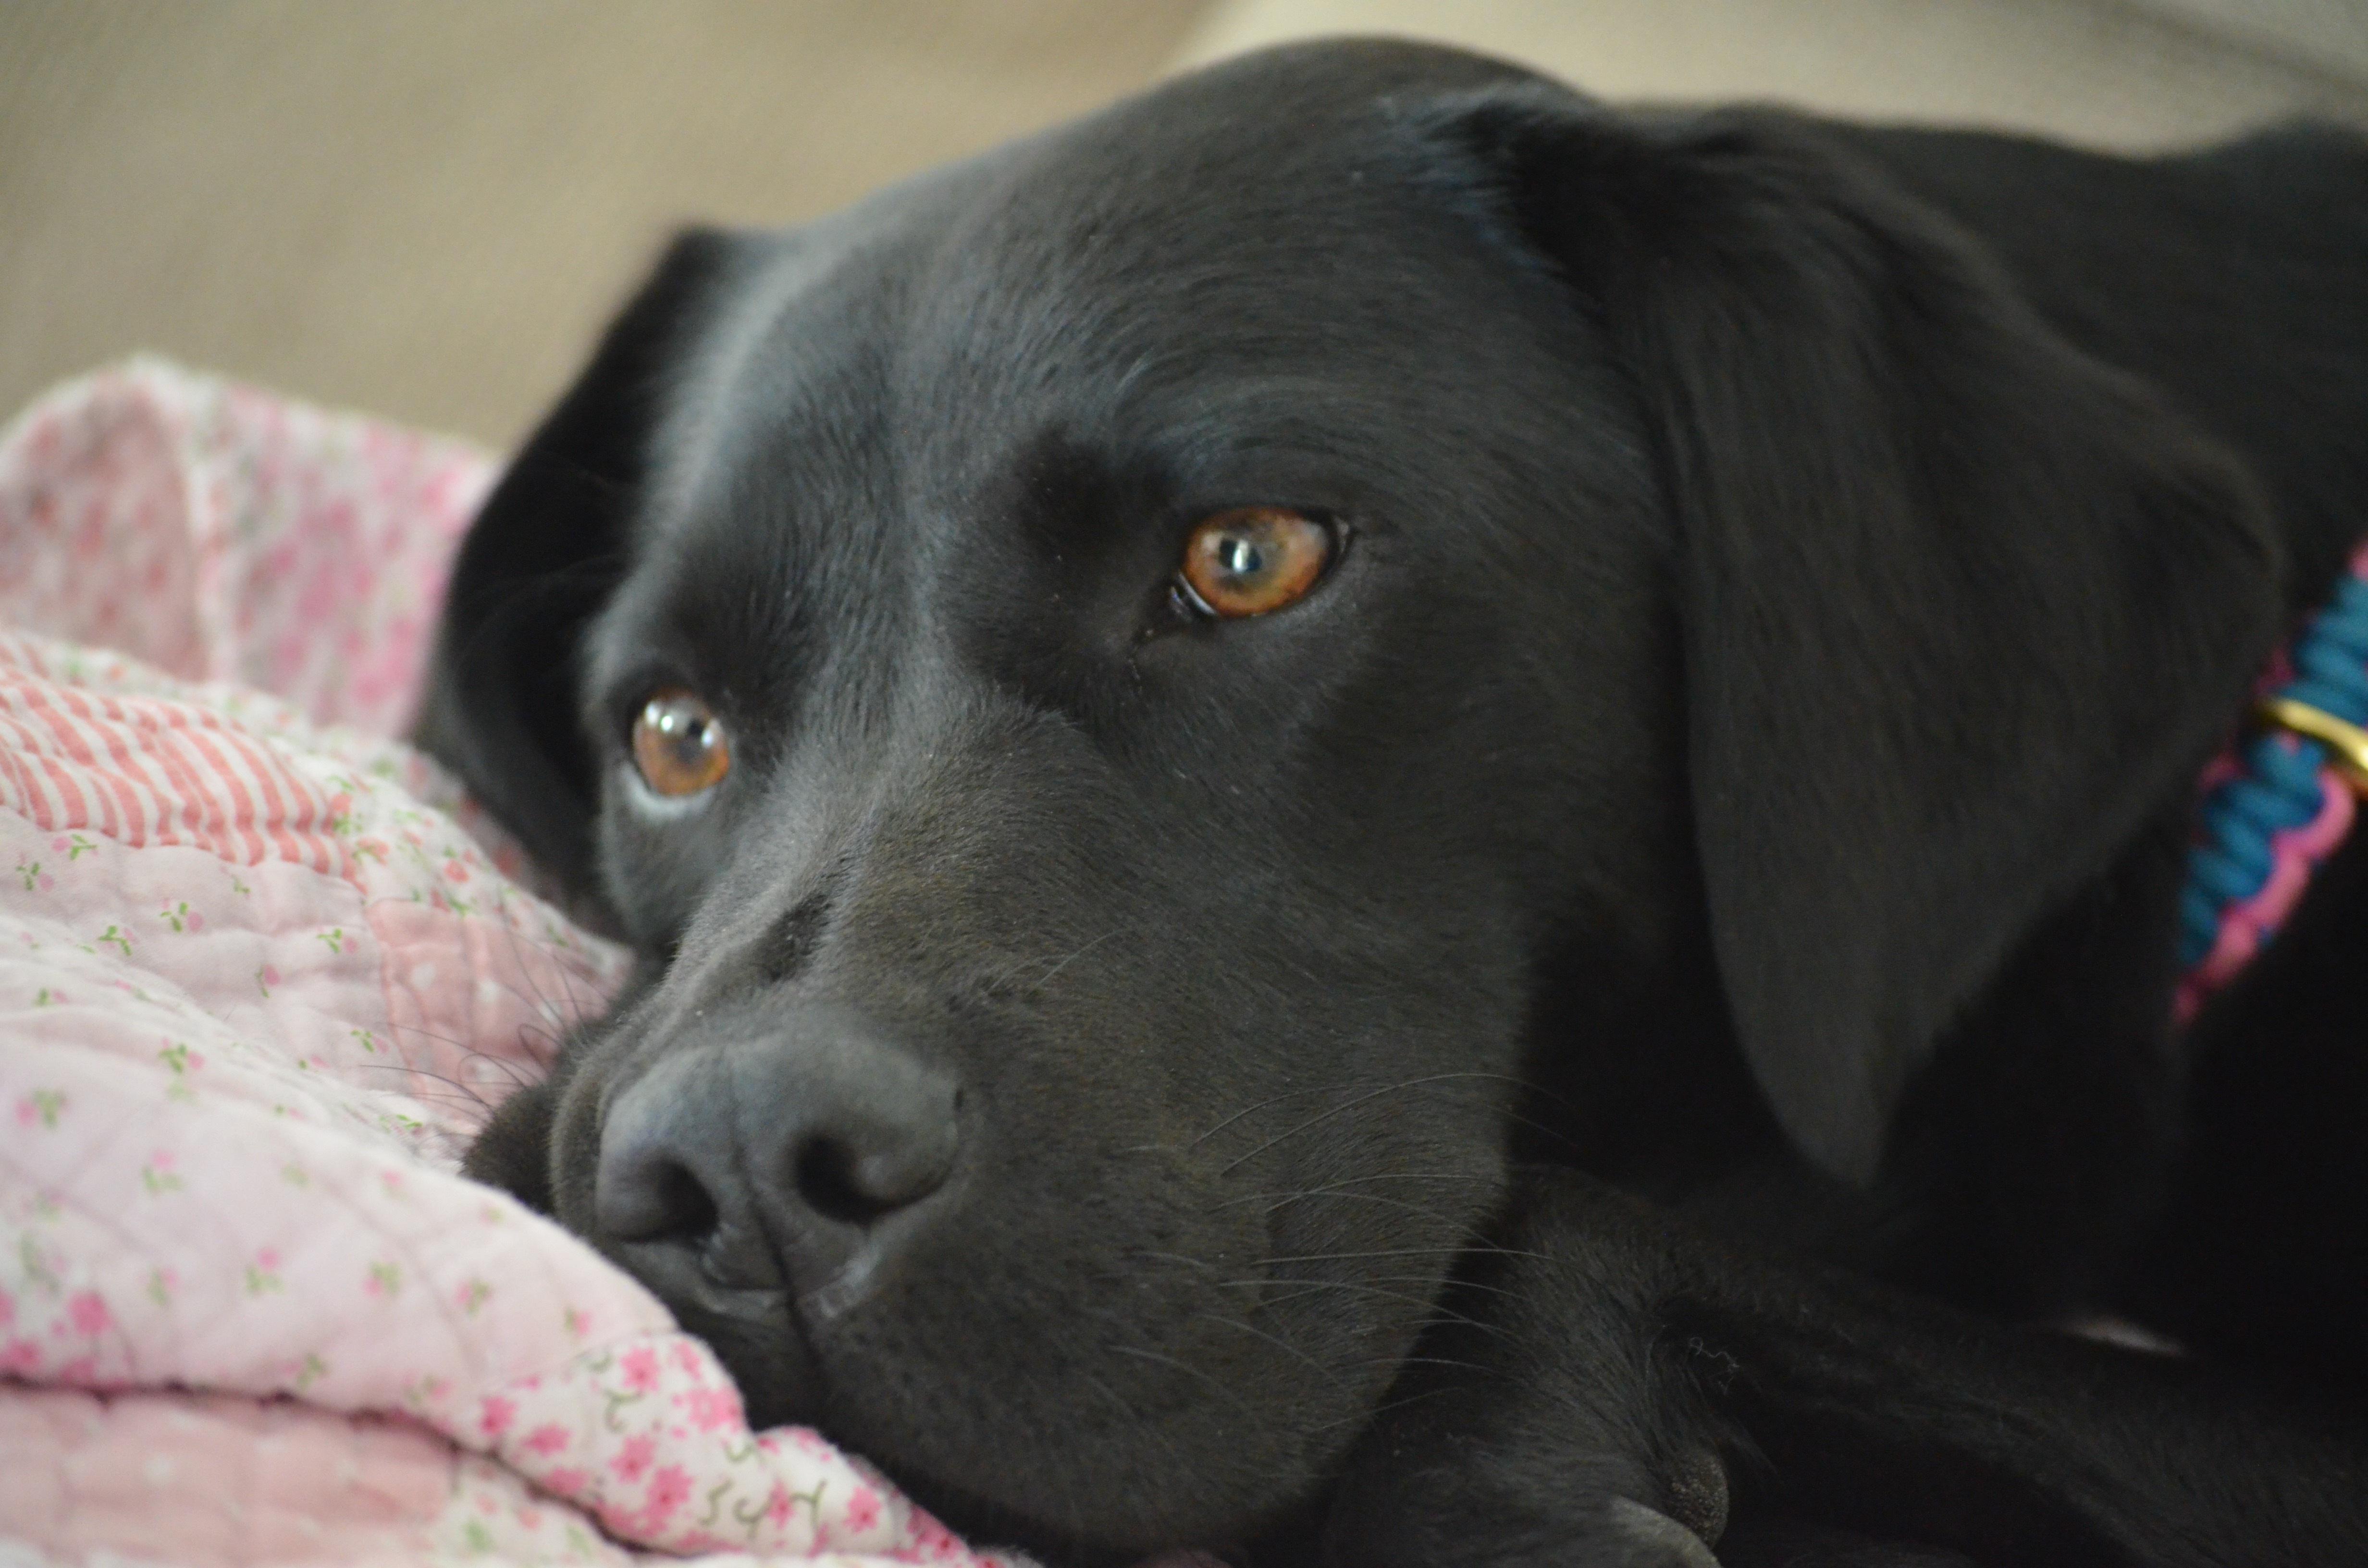 Good Labrador Retriever Black Adorable Dog - puppy-dog-cute-mammal-black-vertebrate-labrador-retriever-adorable-labrador-retriever-doggy-dog-like-mammal-1383065  Snapshot_344723  .jpg